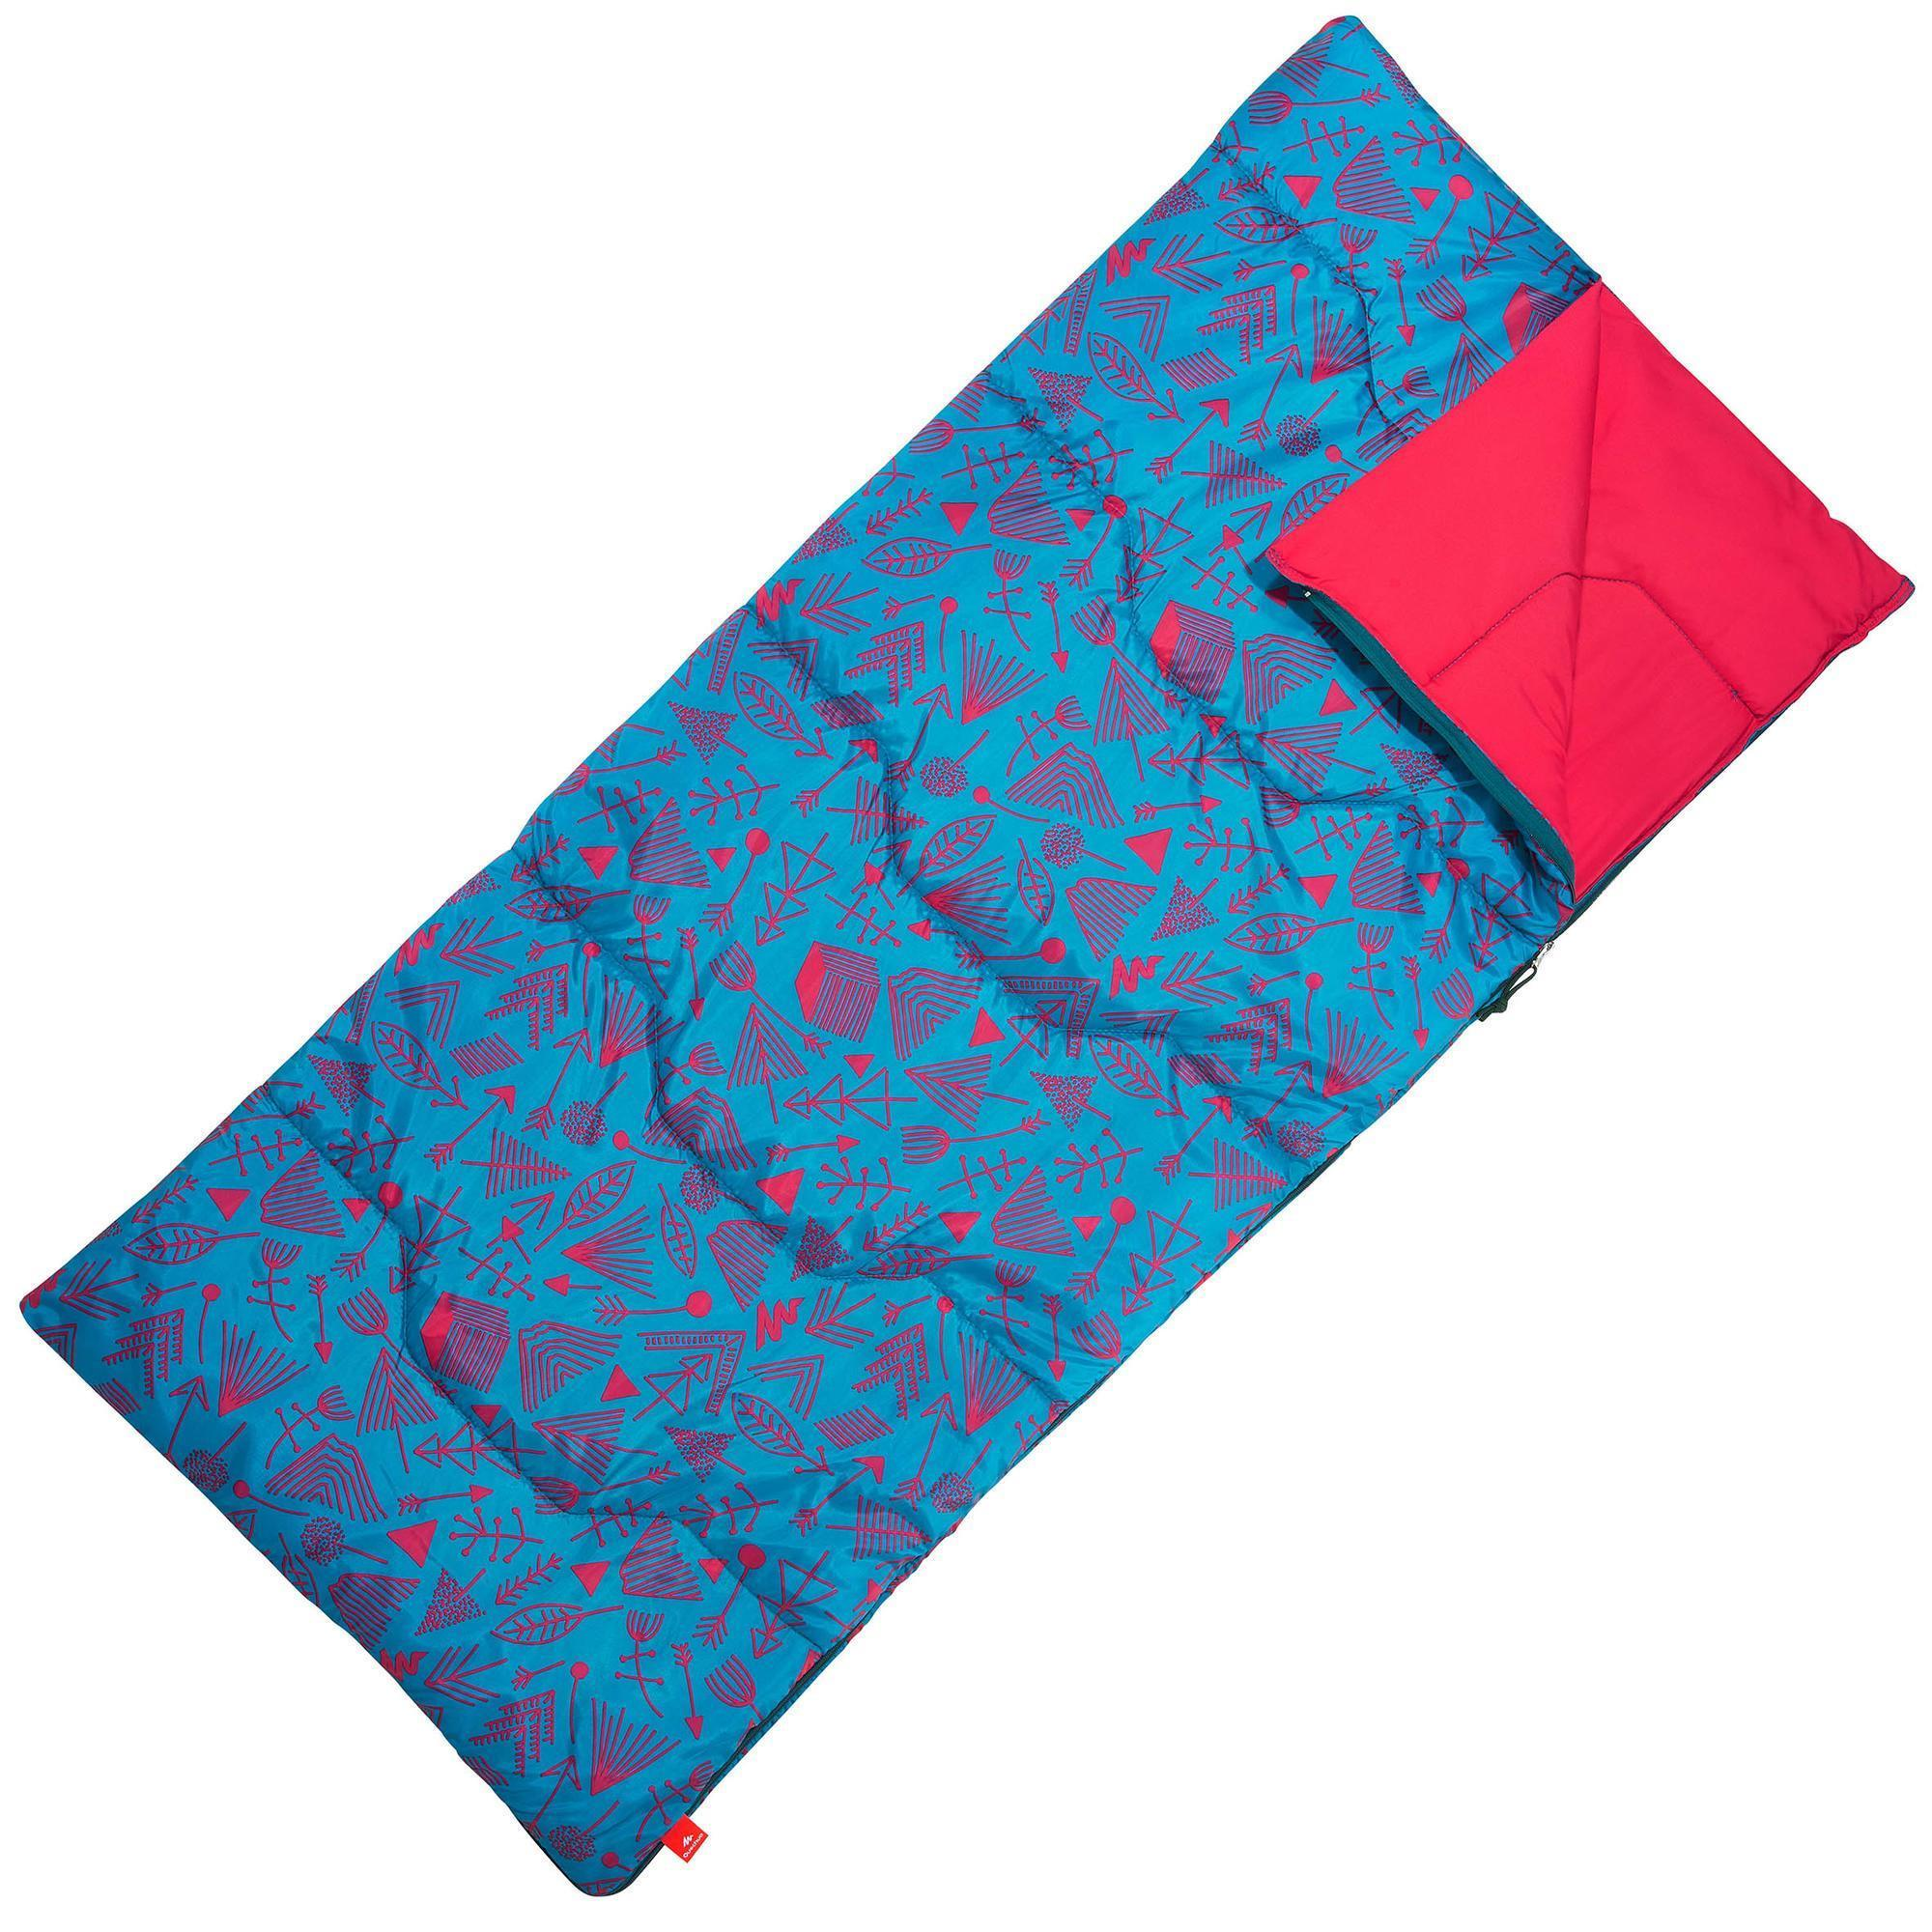 sac de couchage enfant de camping arpenaz 20 quechua. Black Bedroom Furniture Sets. Home Design Ideas